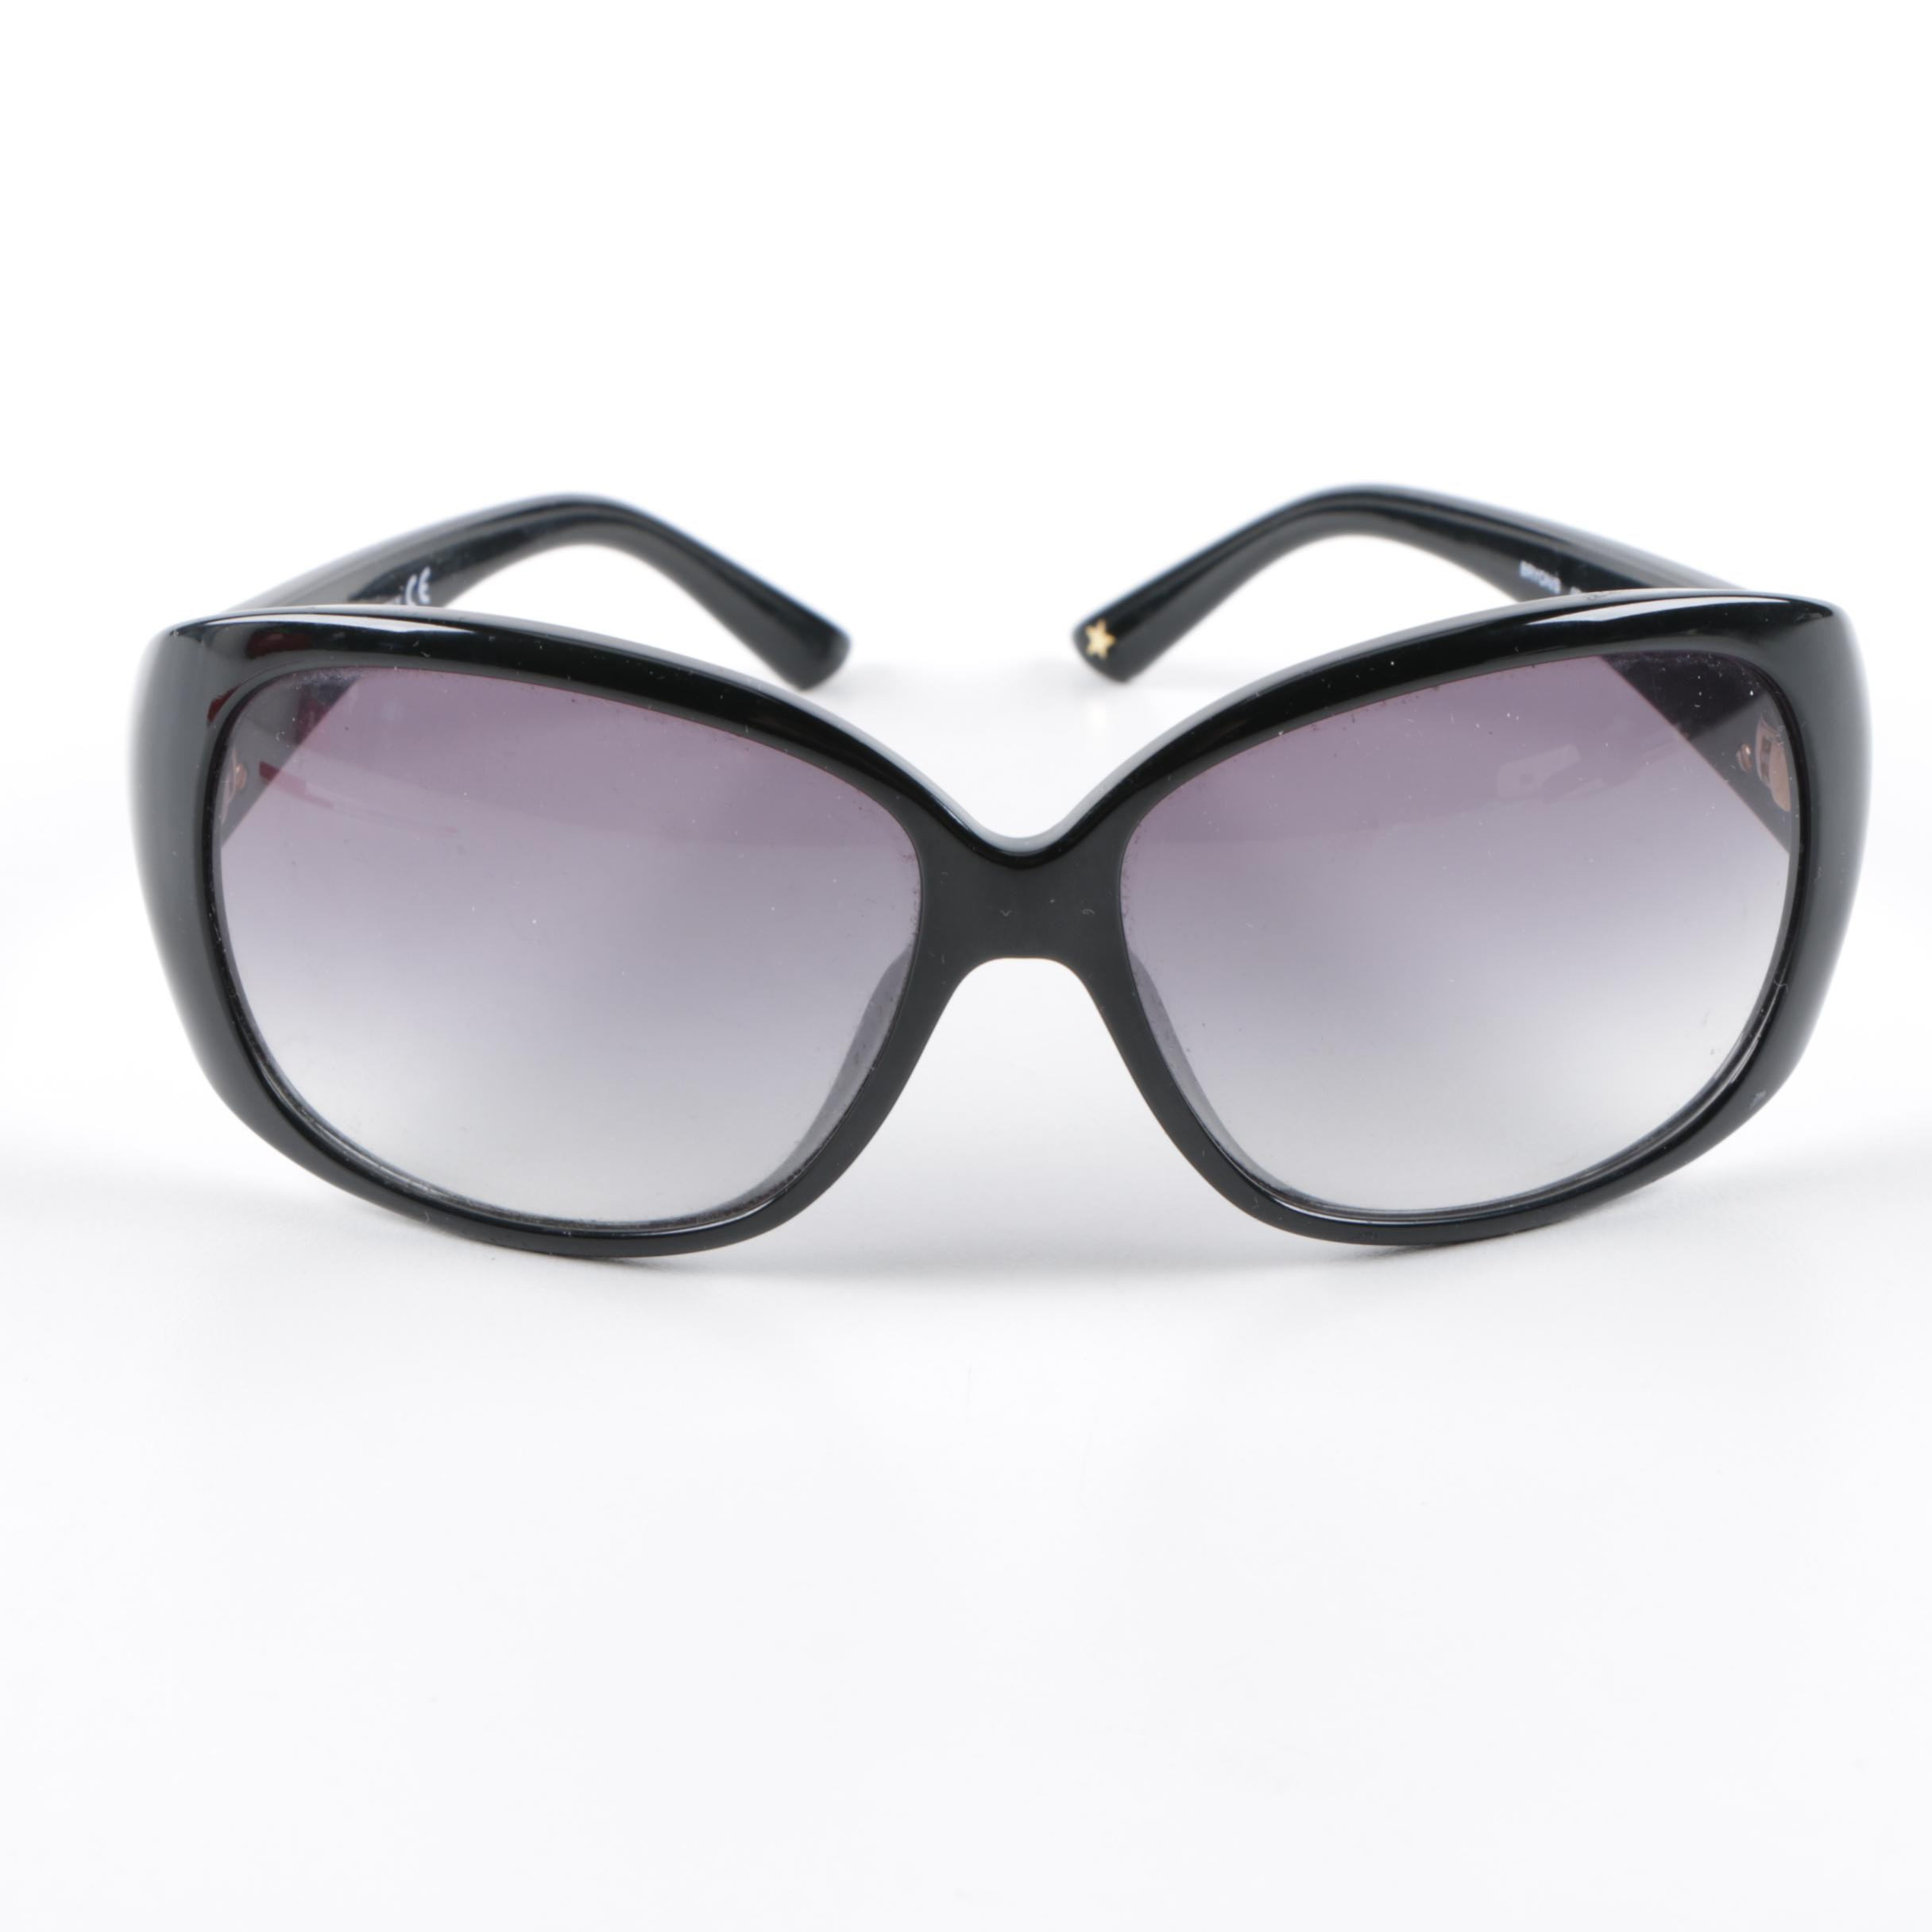 Jimmy Choo Bryon Sunglasses